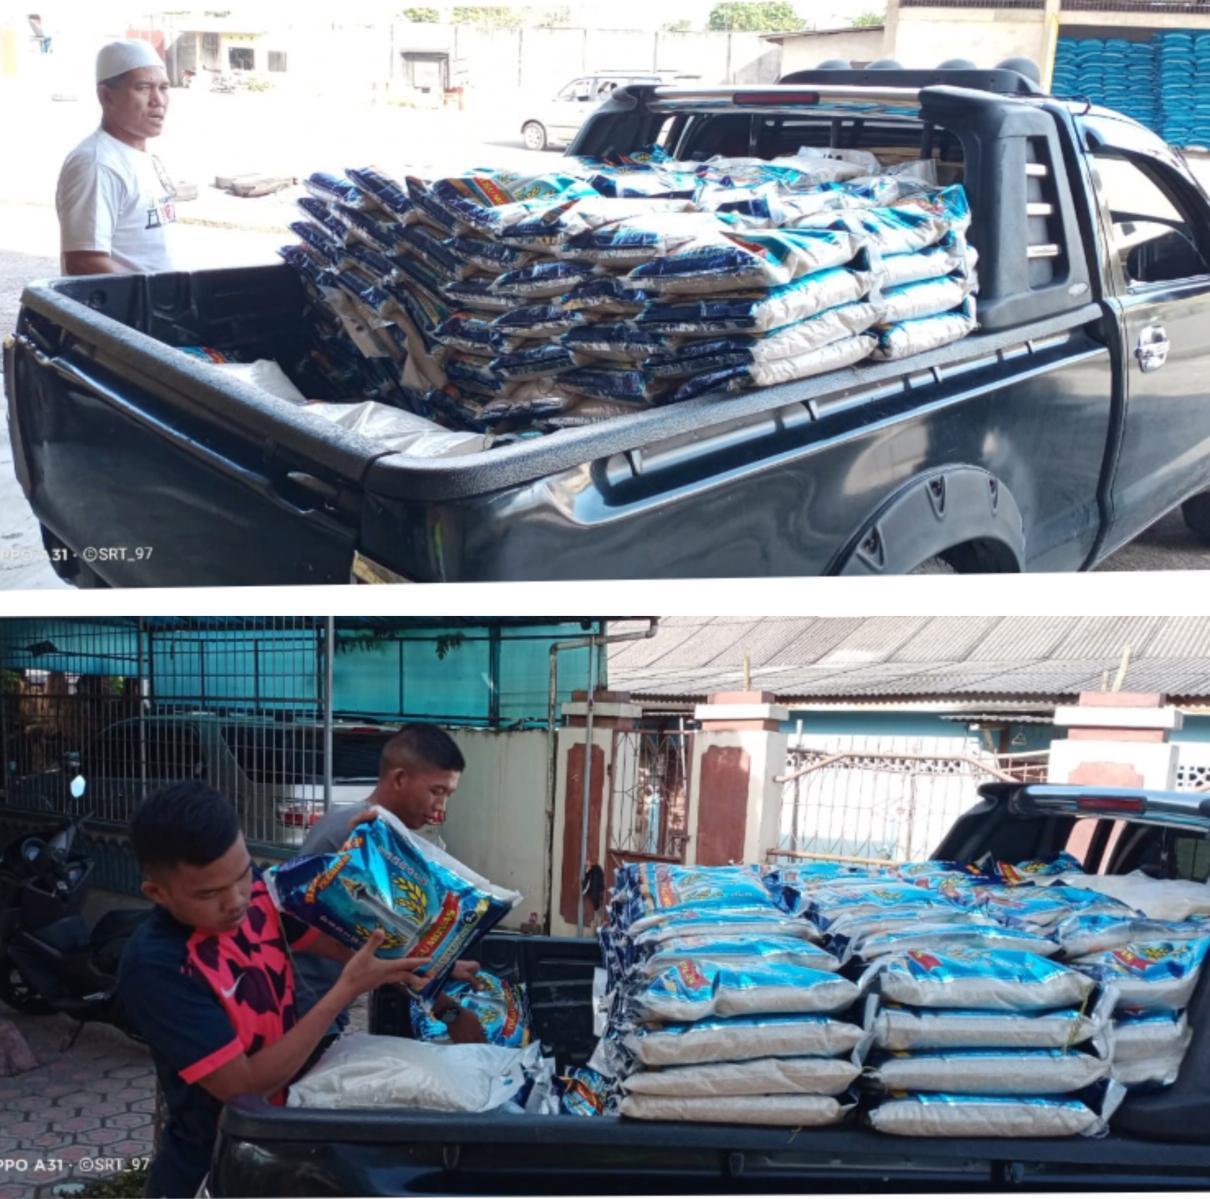 Anggota DPRD Babel Jawarno Bagikan 1,5 Ton Beras Untuk Warga Kace